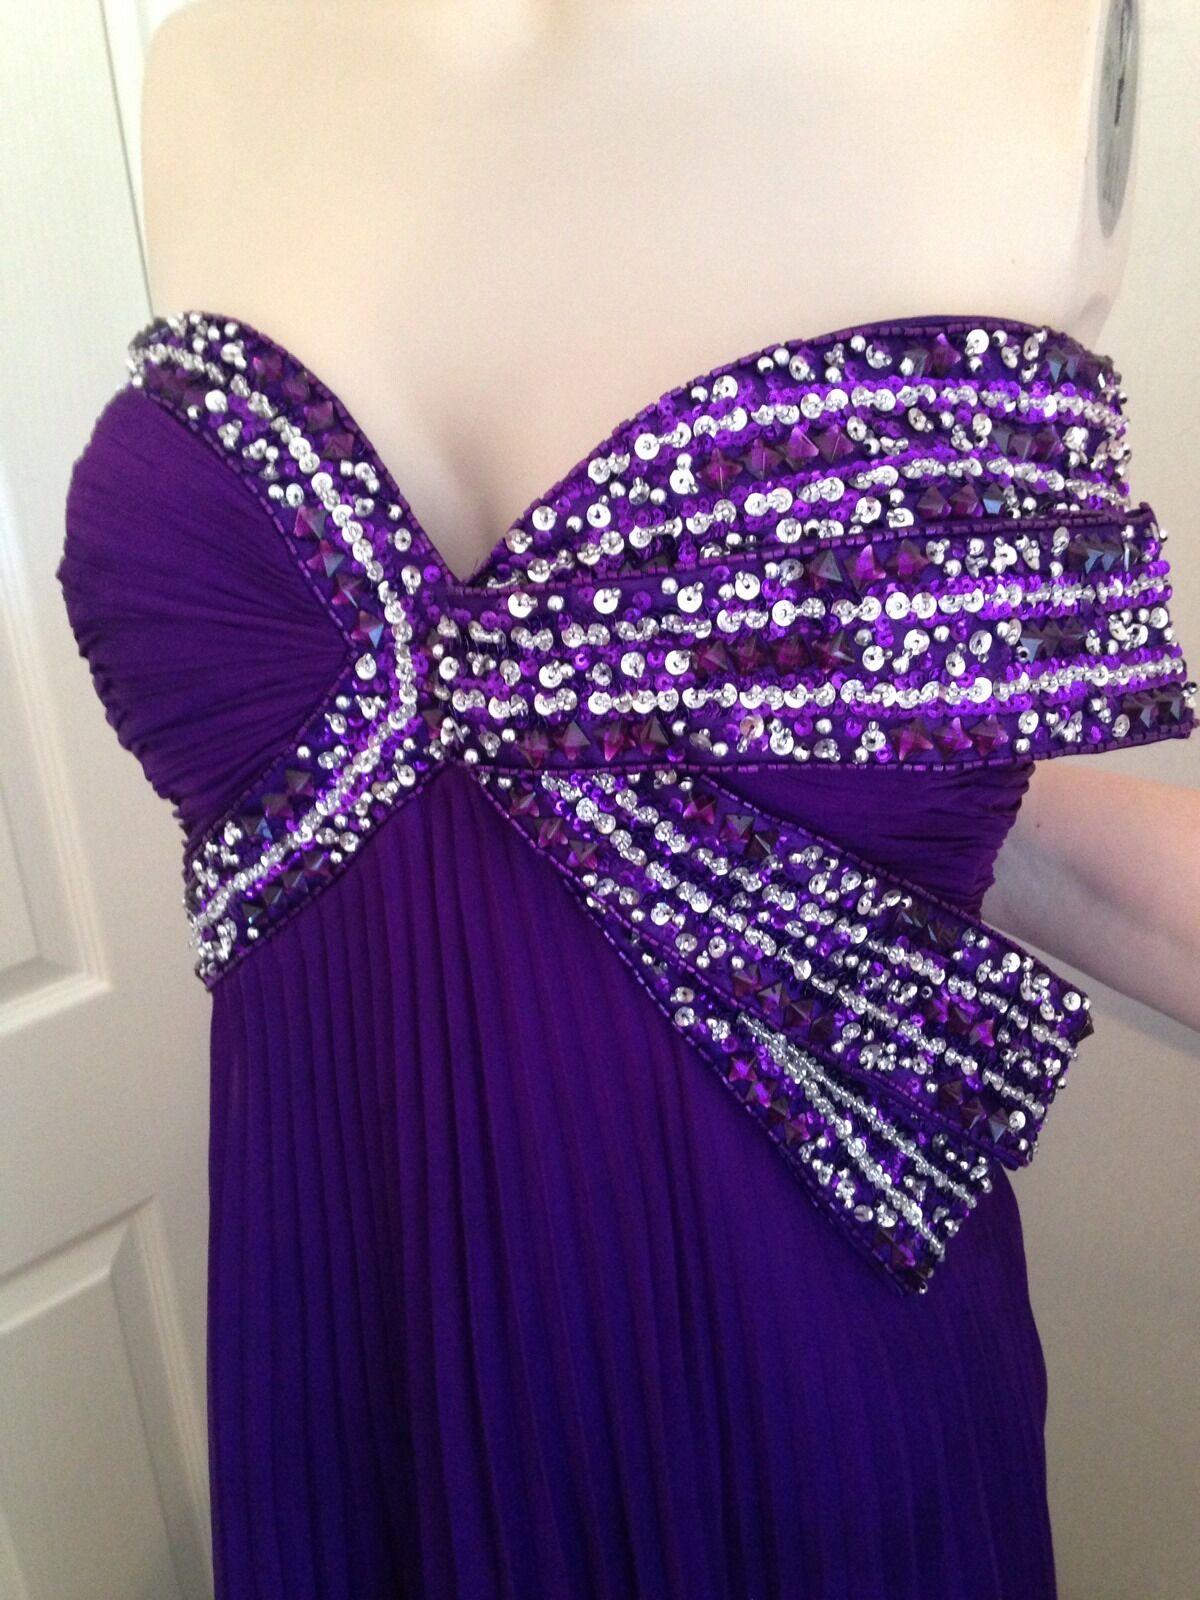 Forever Unique Purple Diamante Long Evening Prom Bridesmaid Dress Size 16